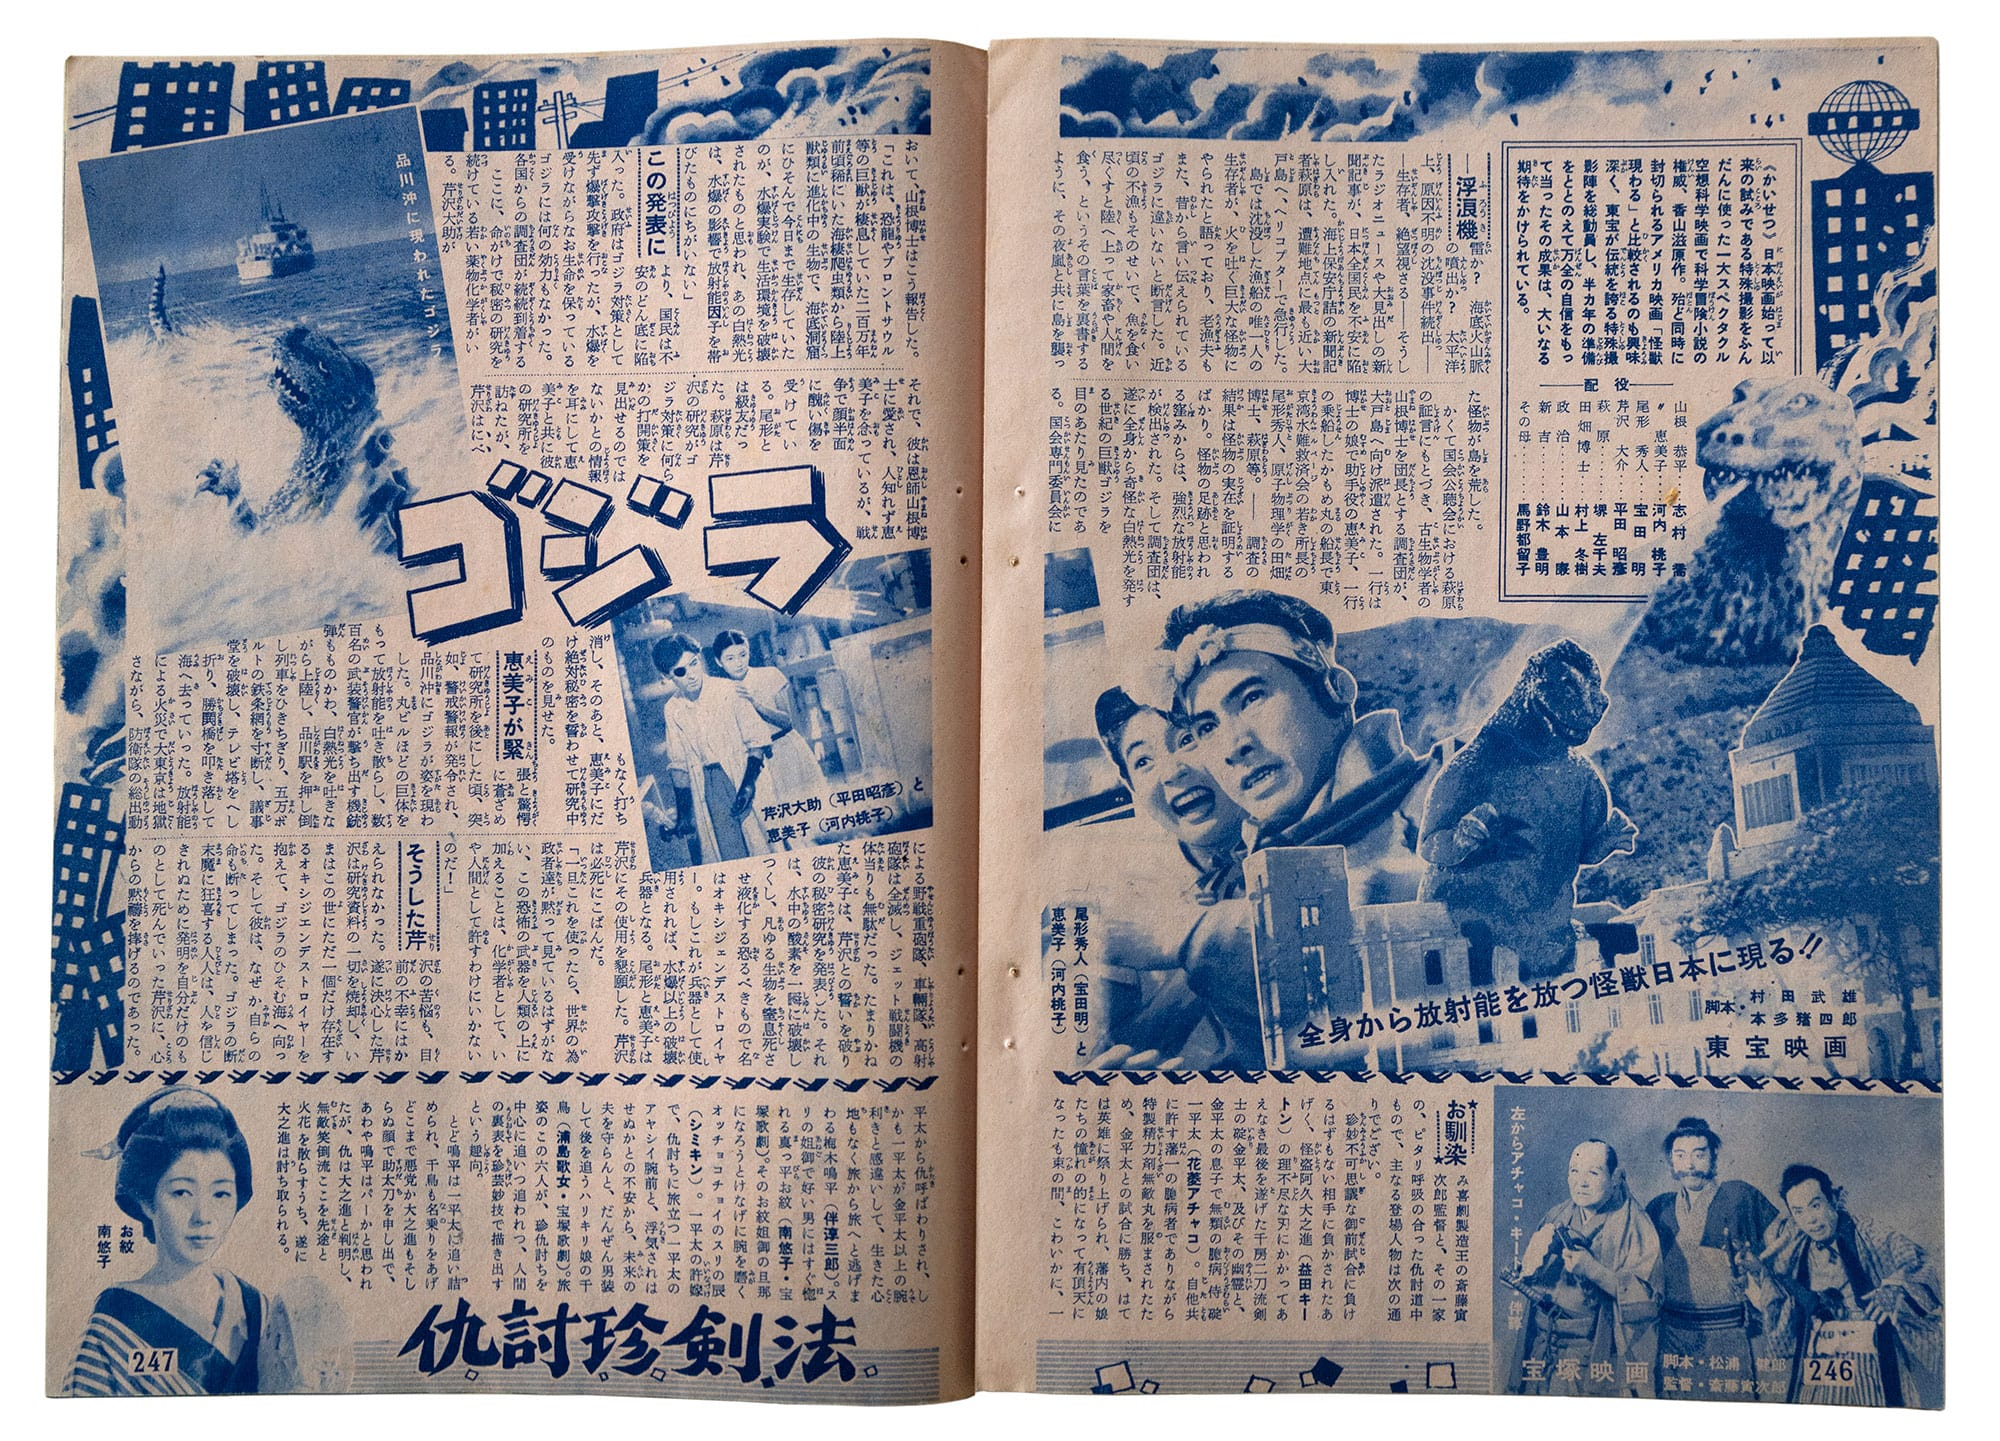 Godzilla 1954 in Japanese Movie Release Collection Magazine